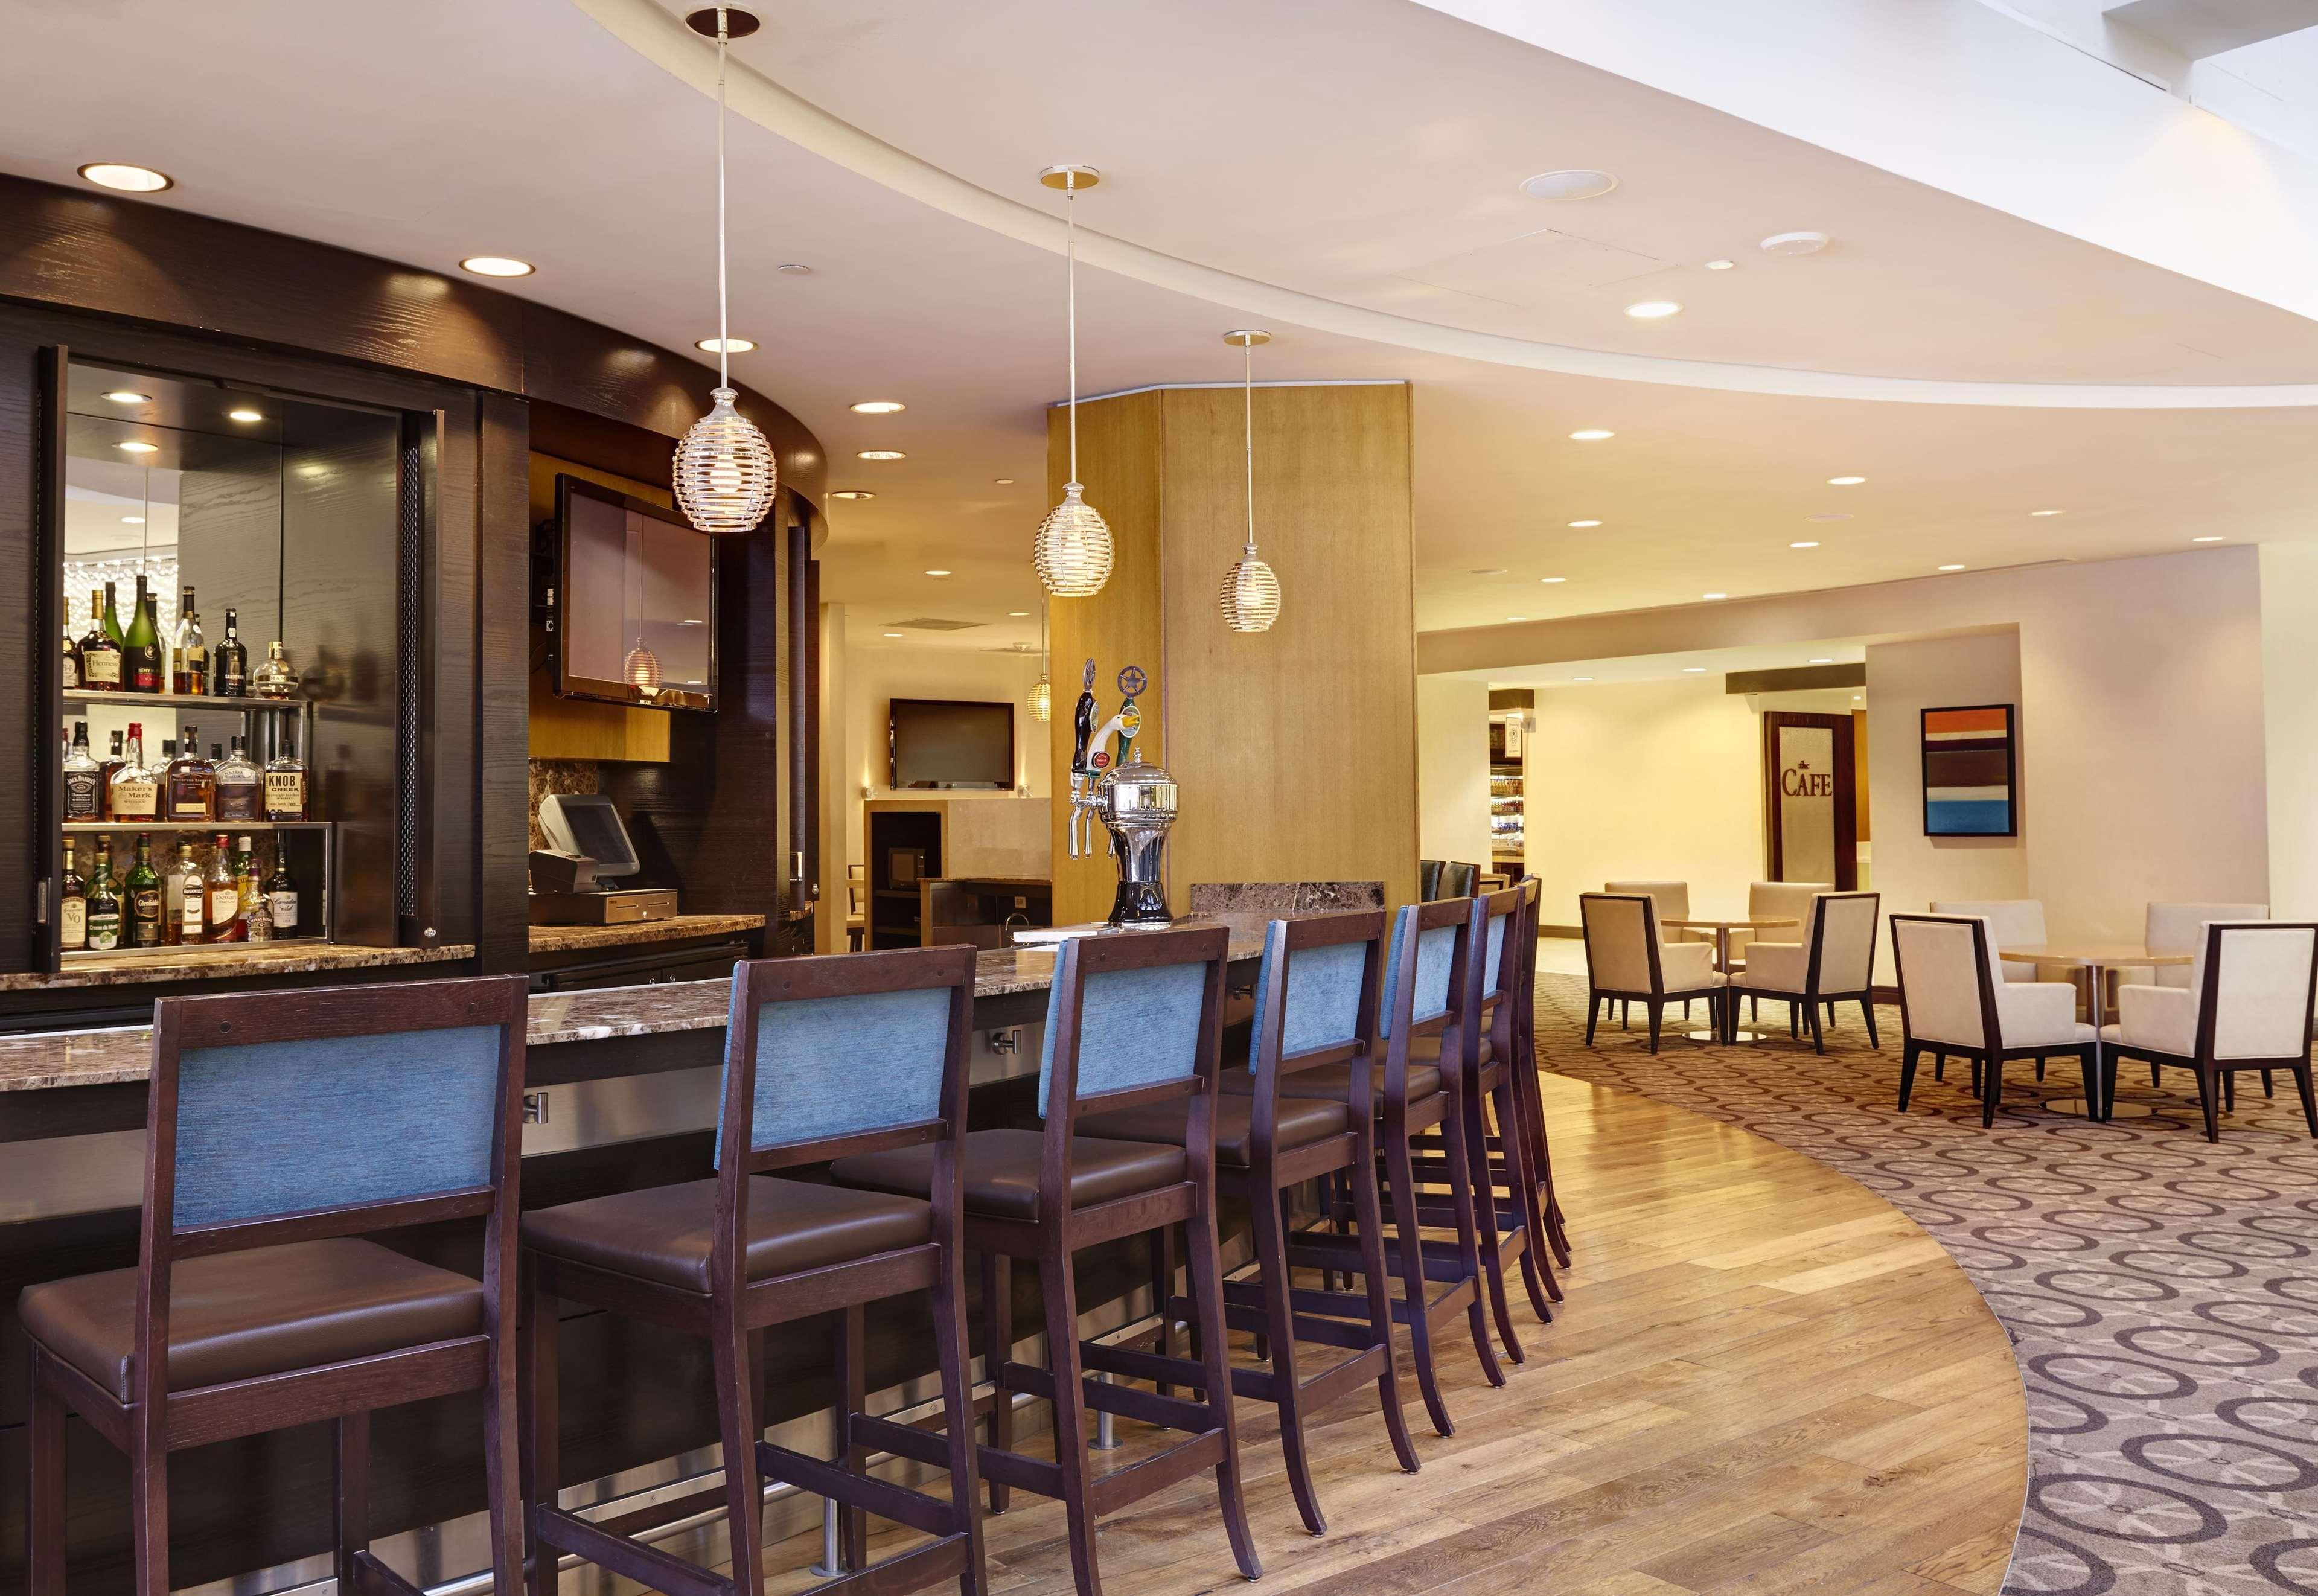 DoubleTree by Hilton Hotel Washington DC - Crystal City 300